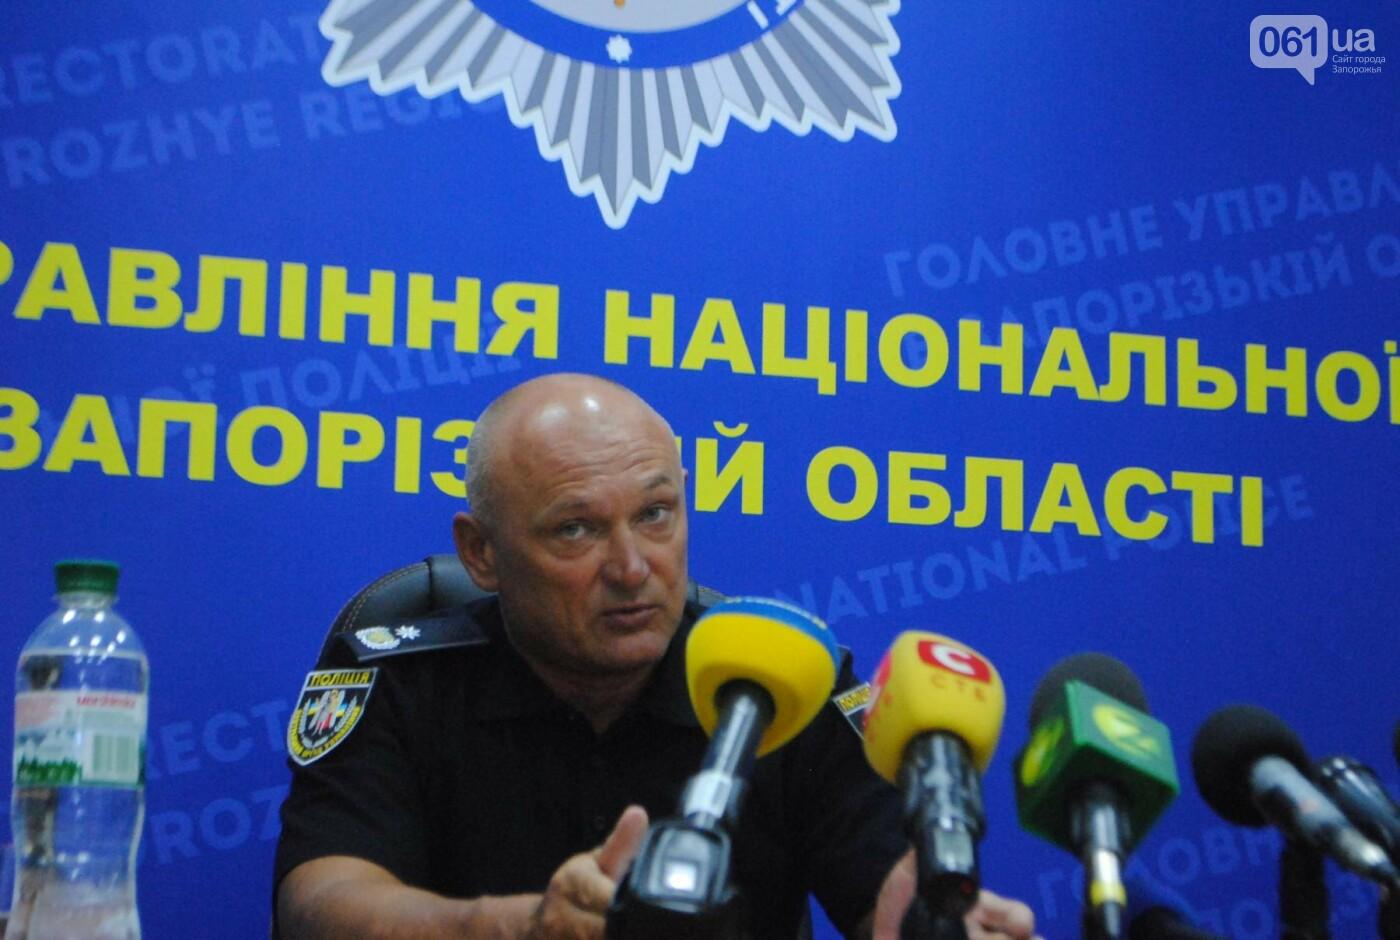 За Олешко следили два дня: в полиции рассказали подробности покушения в Бердянске, - ФОТО, фото-7